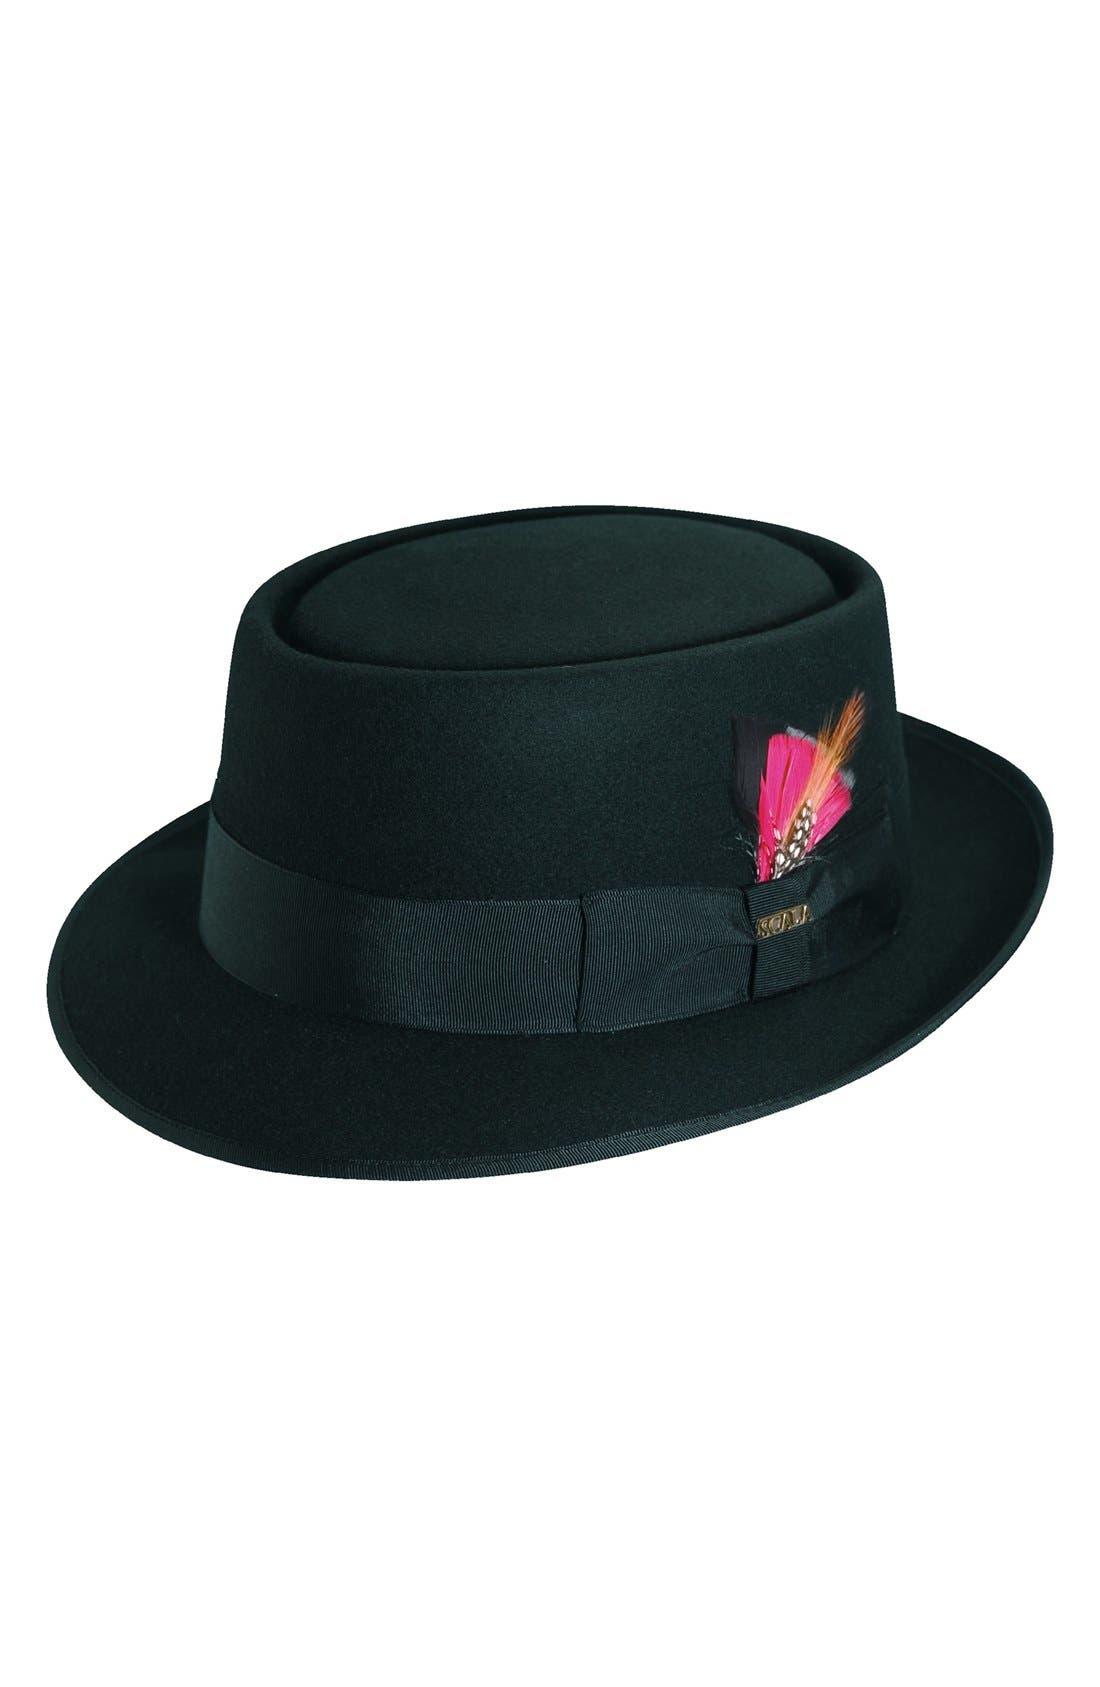 Wool Felt Porkpie Hat,                         Main,                         color, Black/ Red